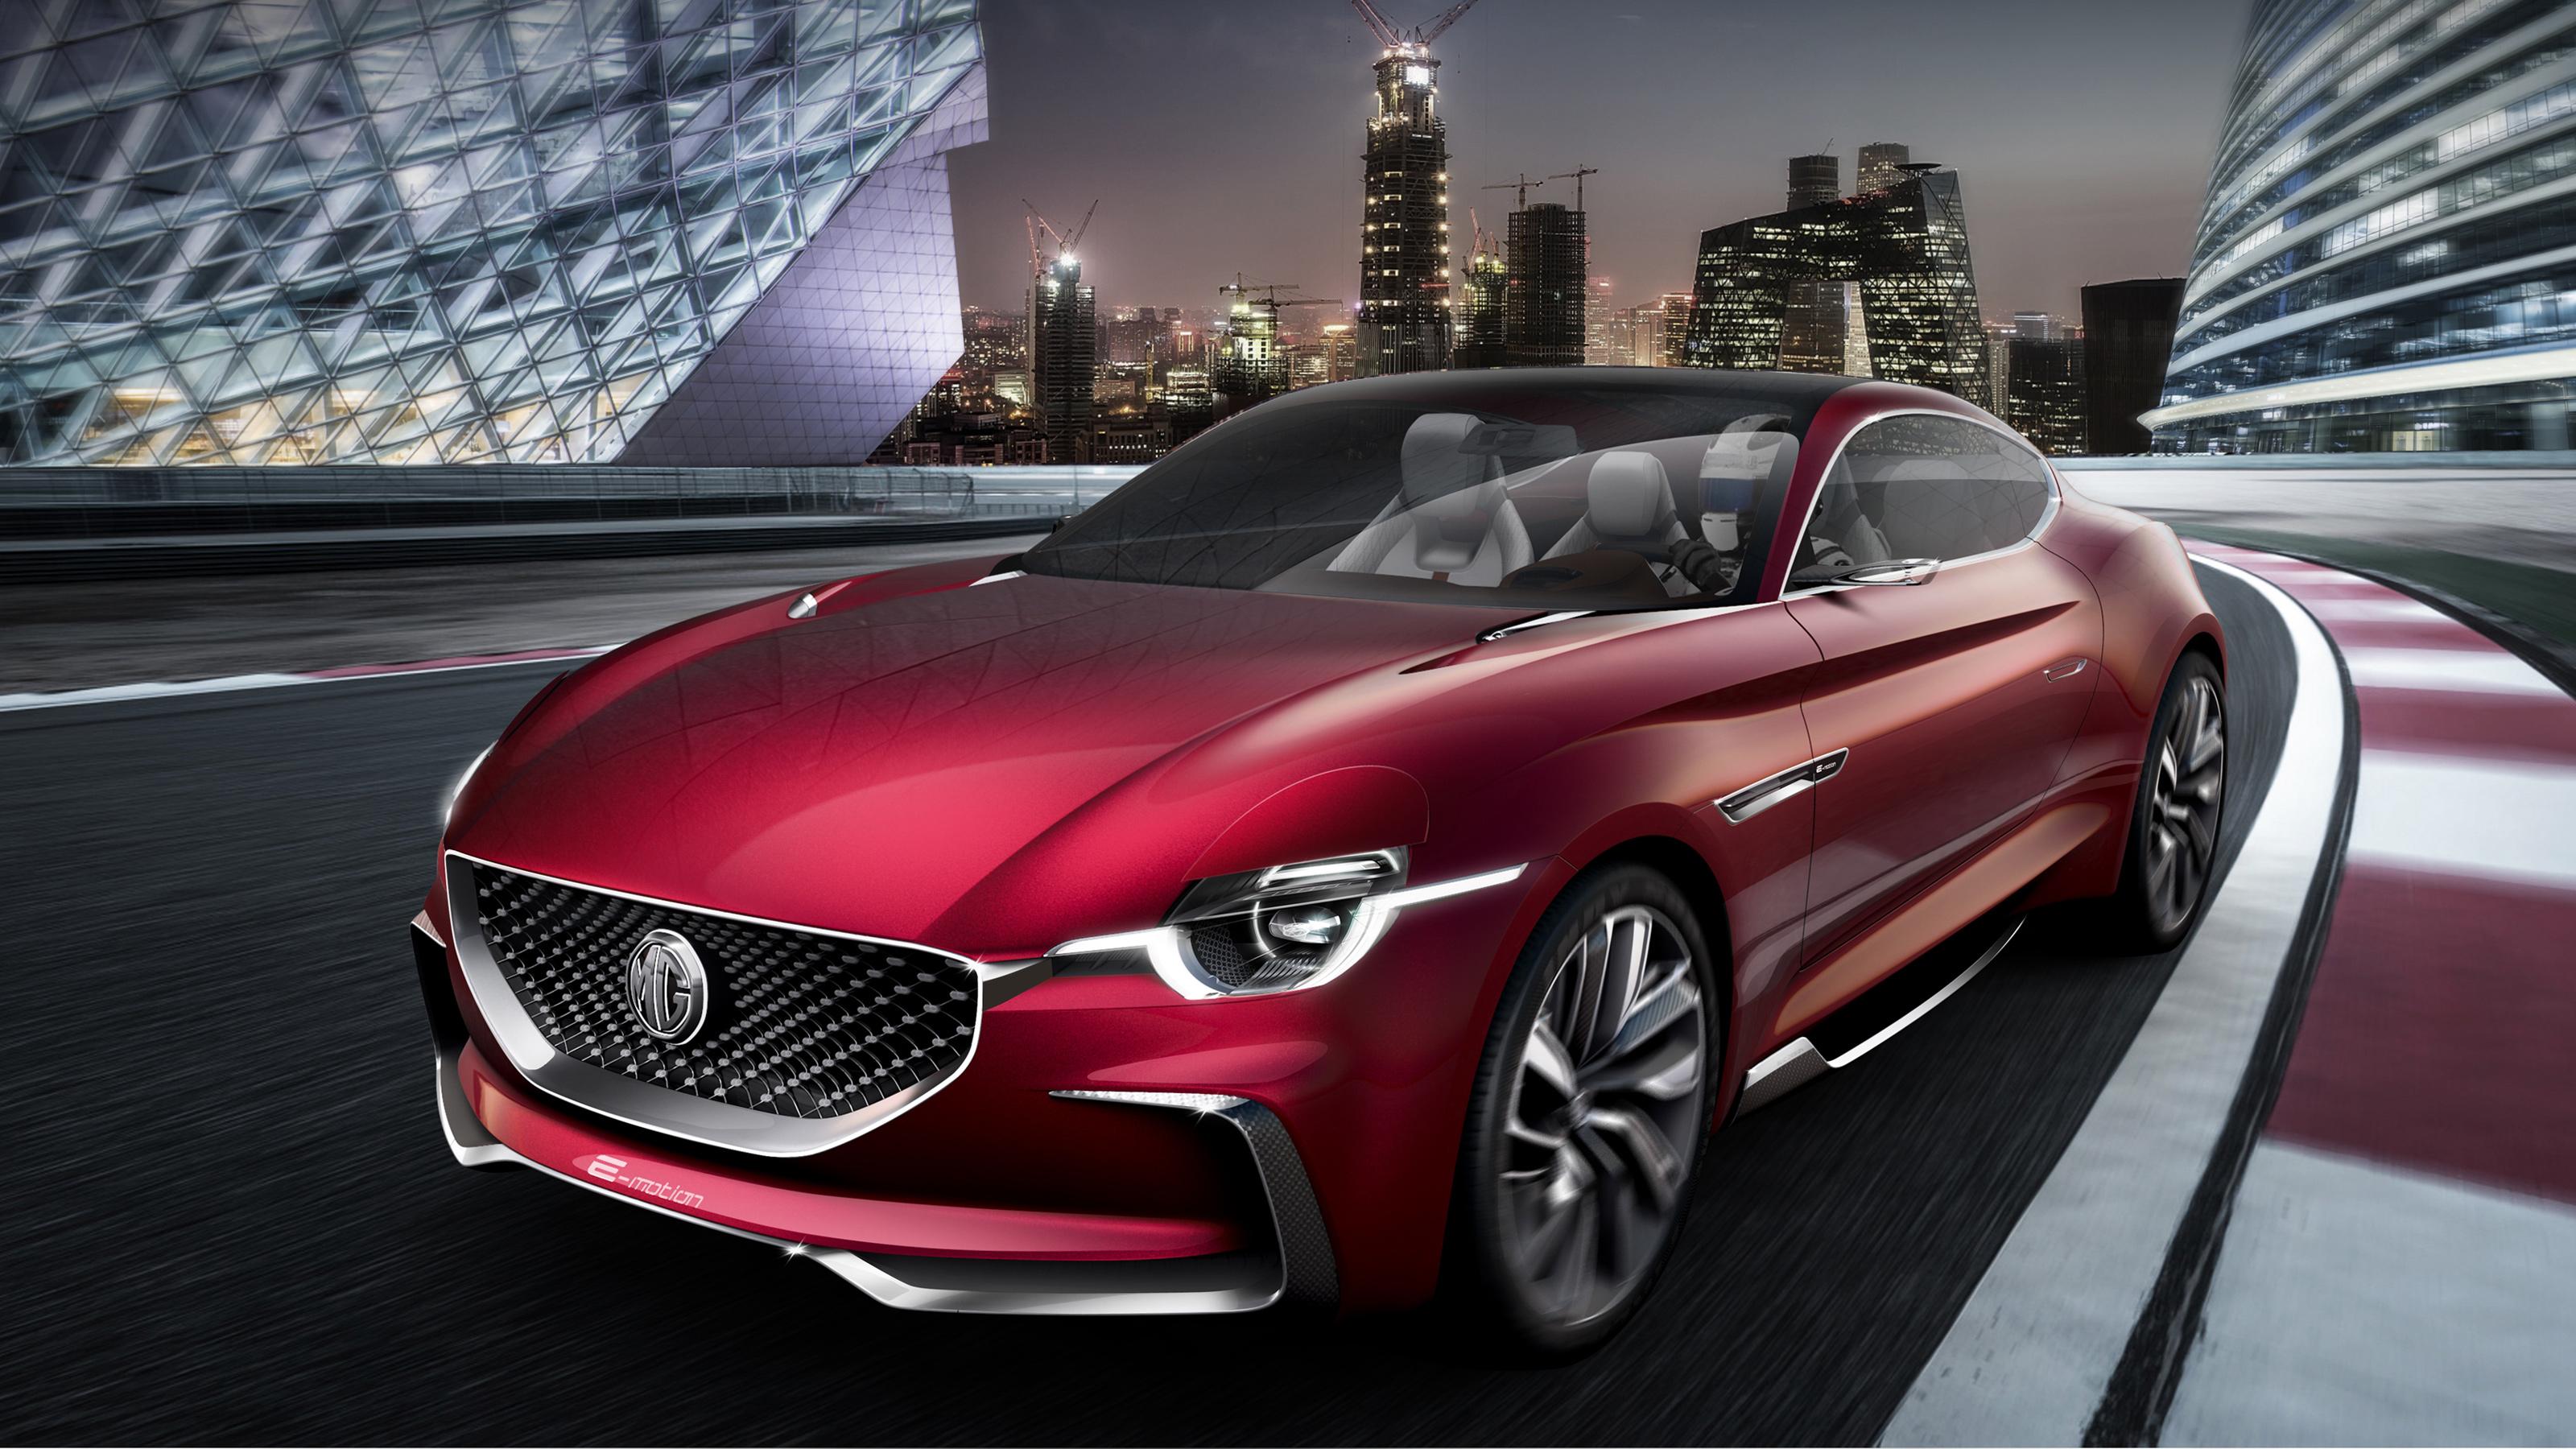 Mg E Motion Concept Car Wallpaper Hd Car Wallpapers